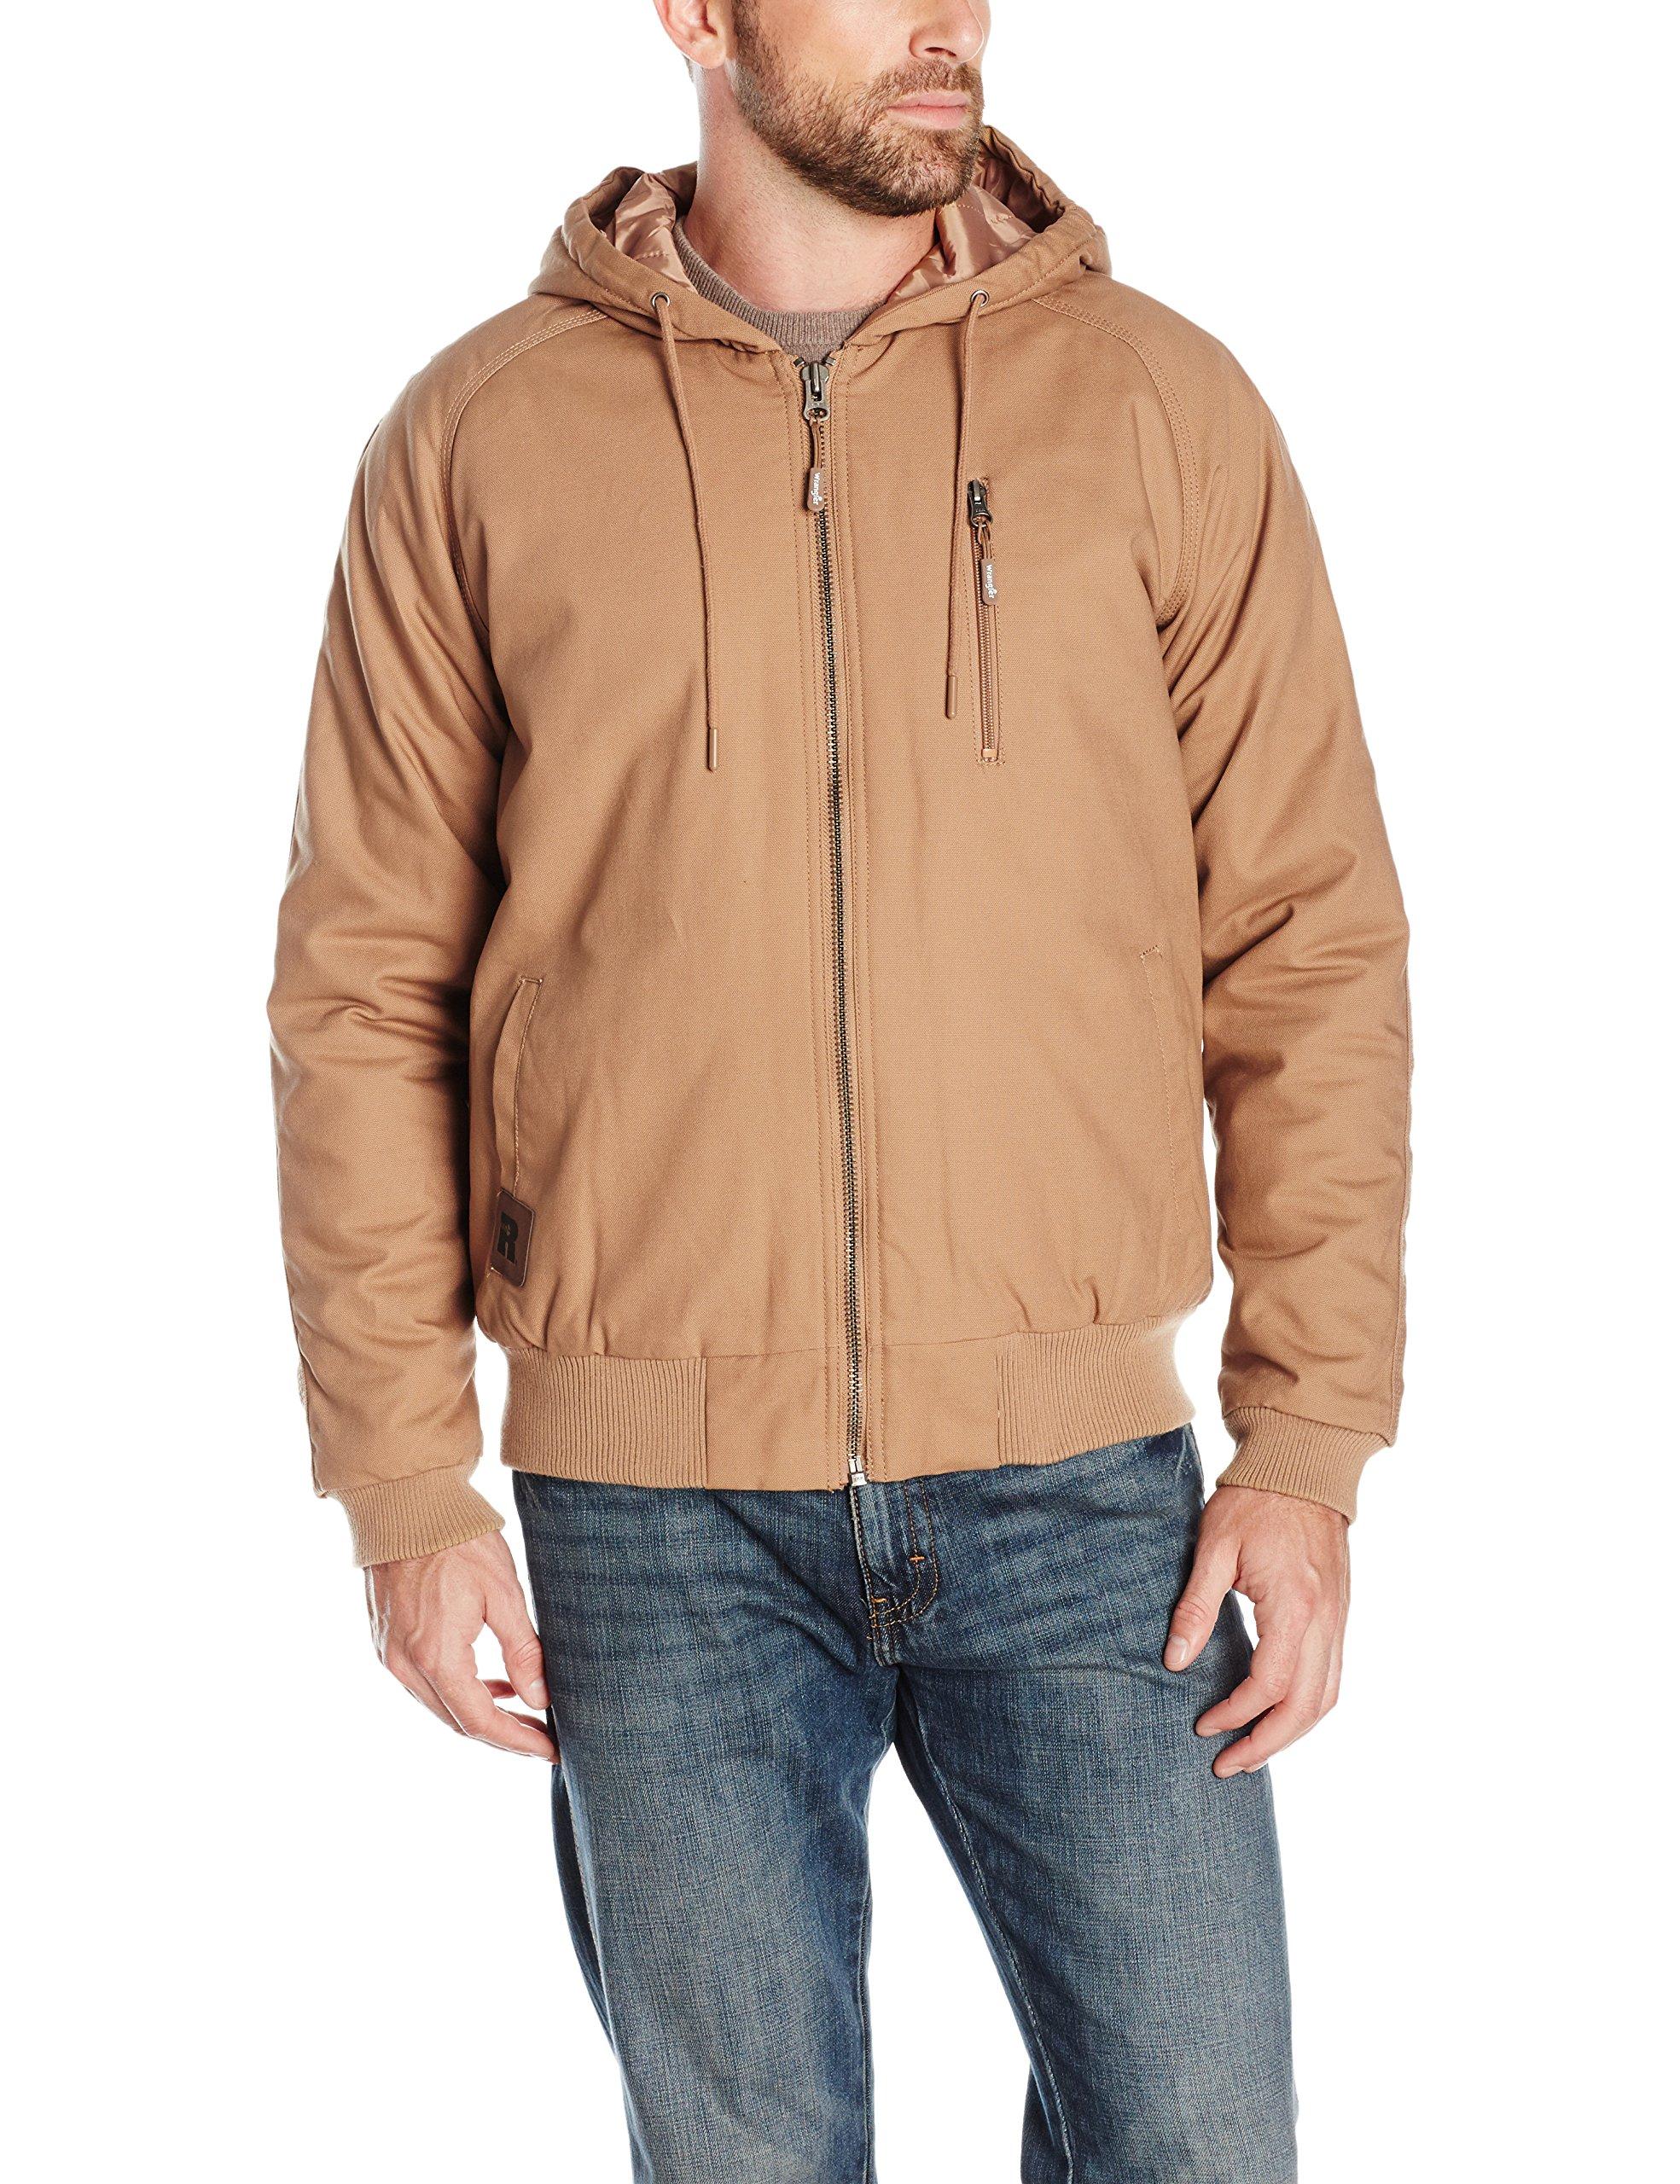 Wrangler Riggs Workwear Men's Utility Hooded Jacket, Rawhide, Large